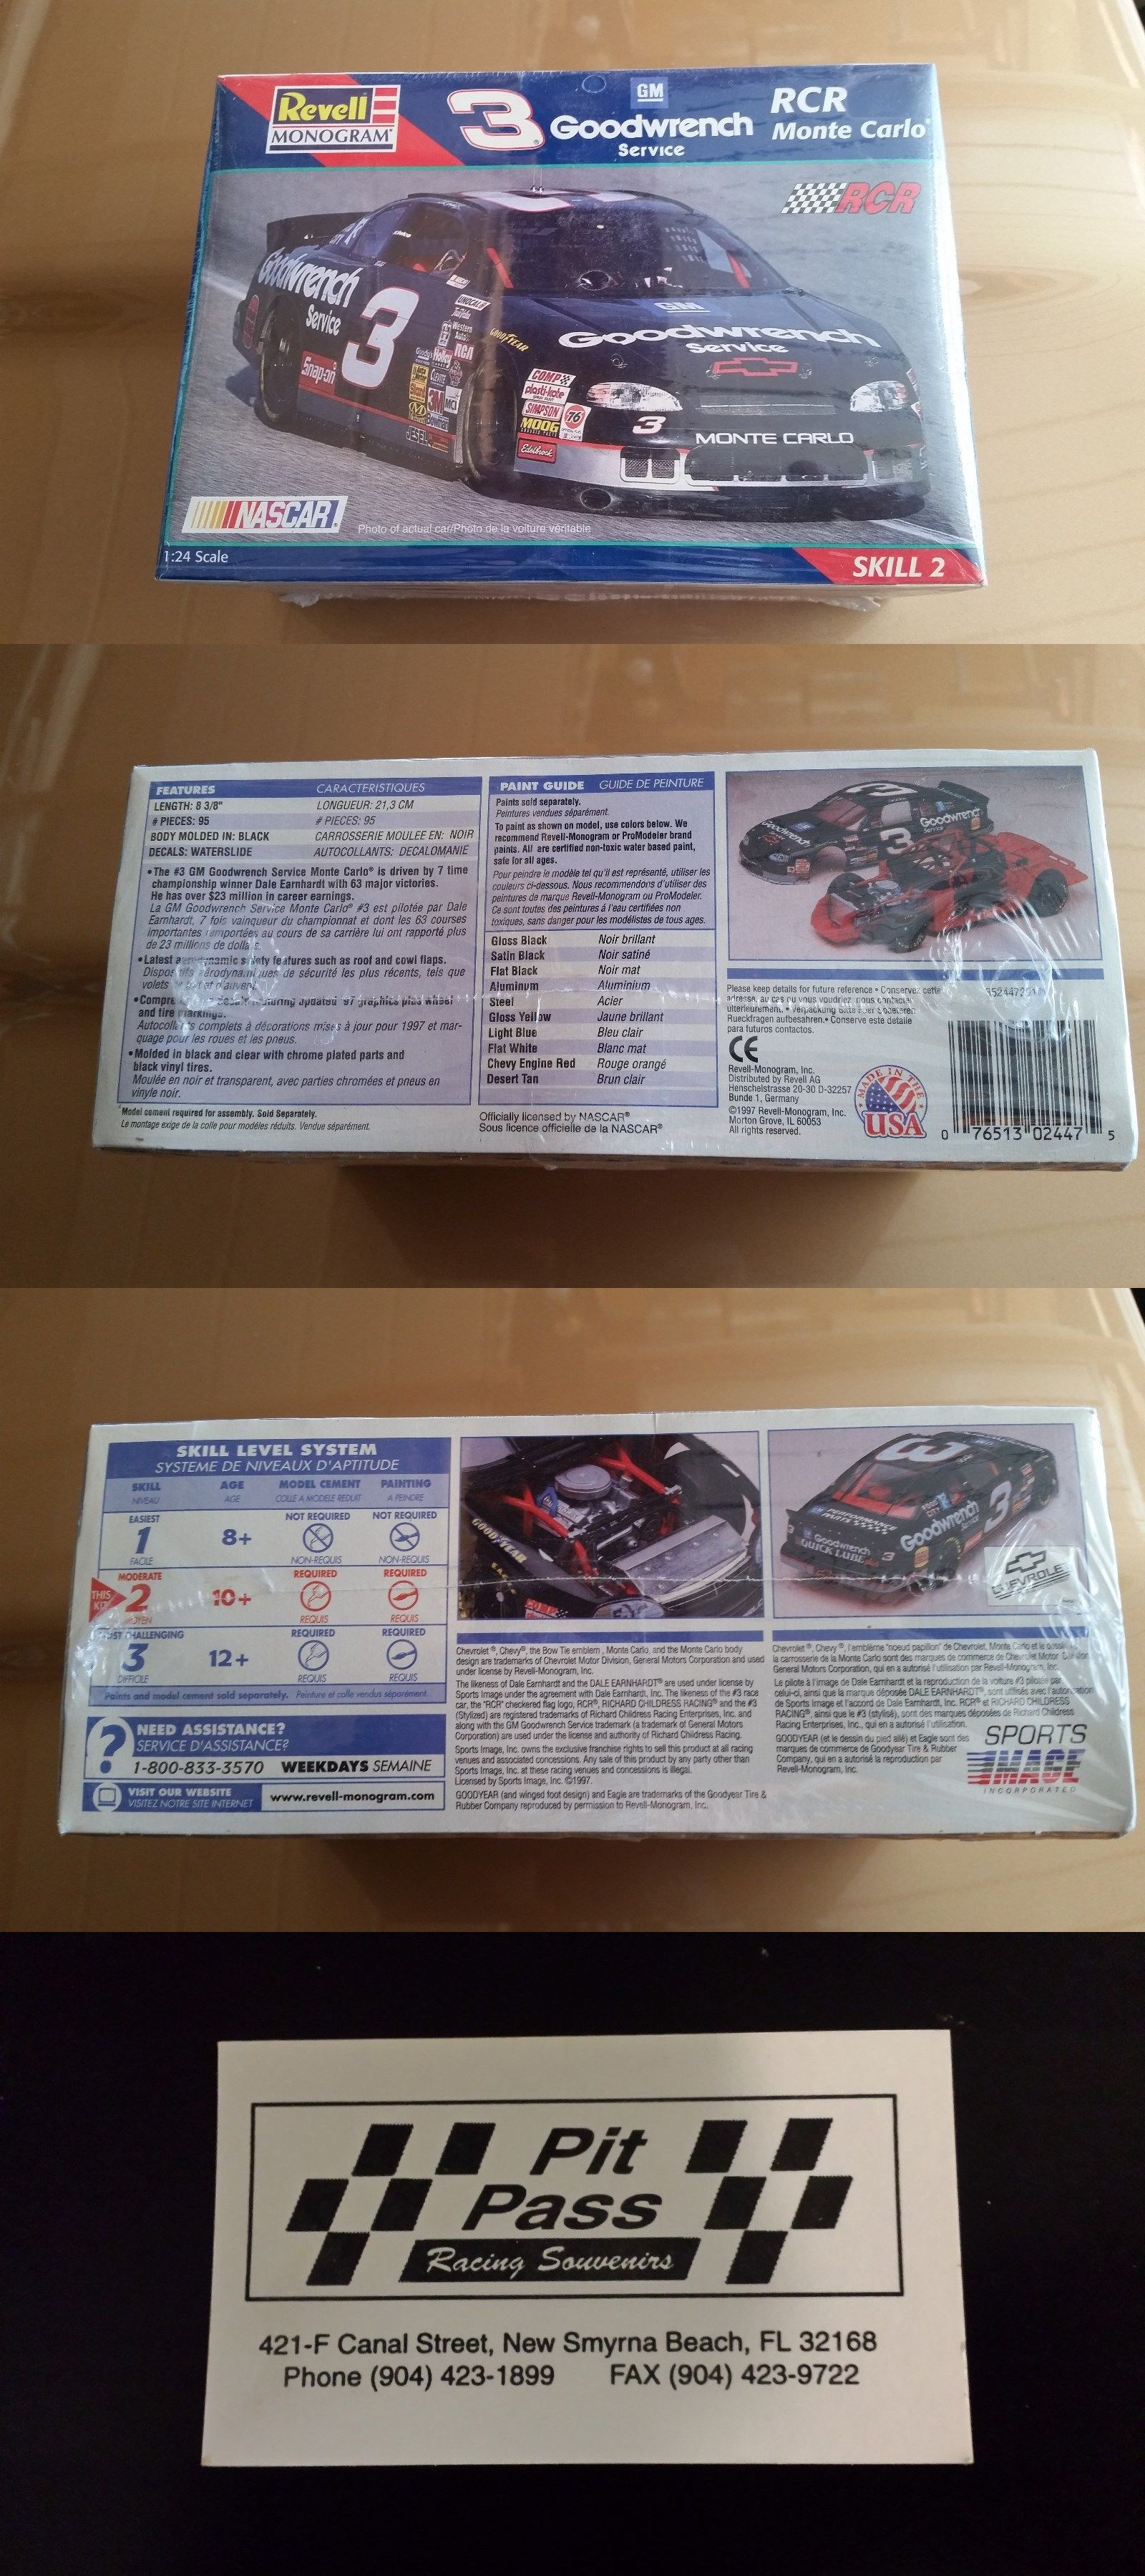 Kits 145964: Dale Earnhardt Sr 1997 # 3 Goodwrench Service Chevrolet